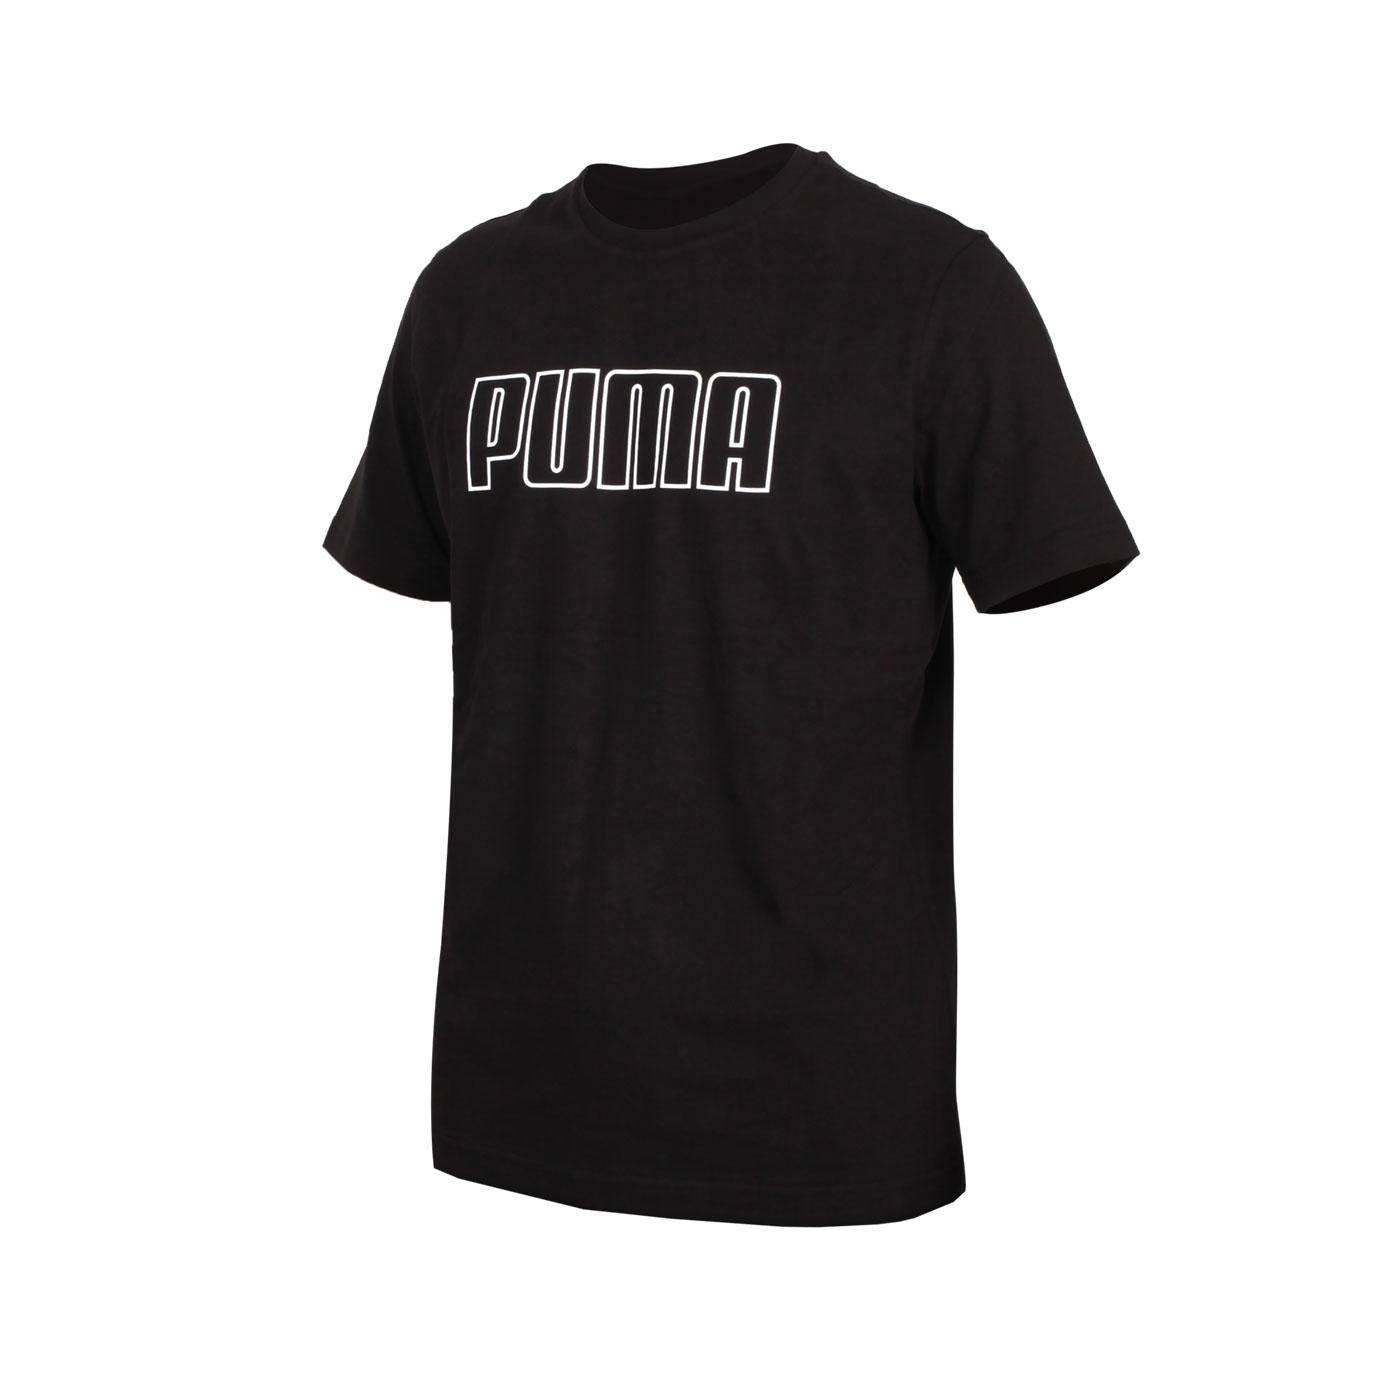 PUMA 男款基本系列短袖T恤 58716001 - 黑白